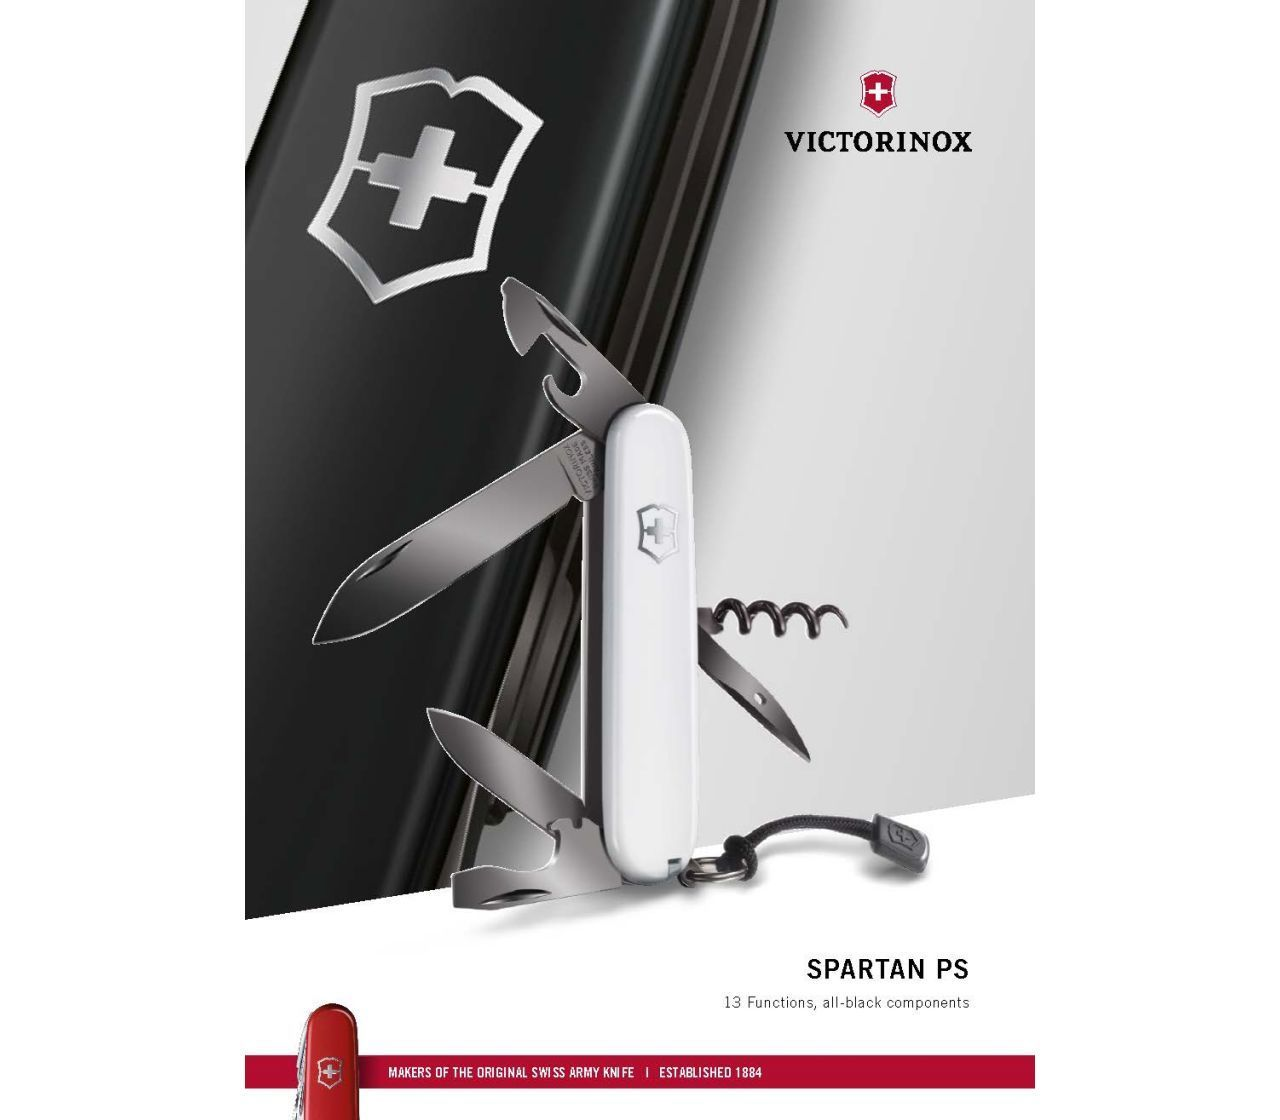 Складной нож Victorinox Spartan PS White (1.3603.7P) 91 мм., 13 функций, подарочная упаковка- Wenger-Victorinox.Ru